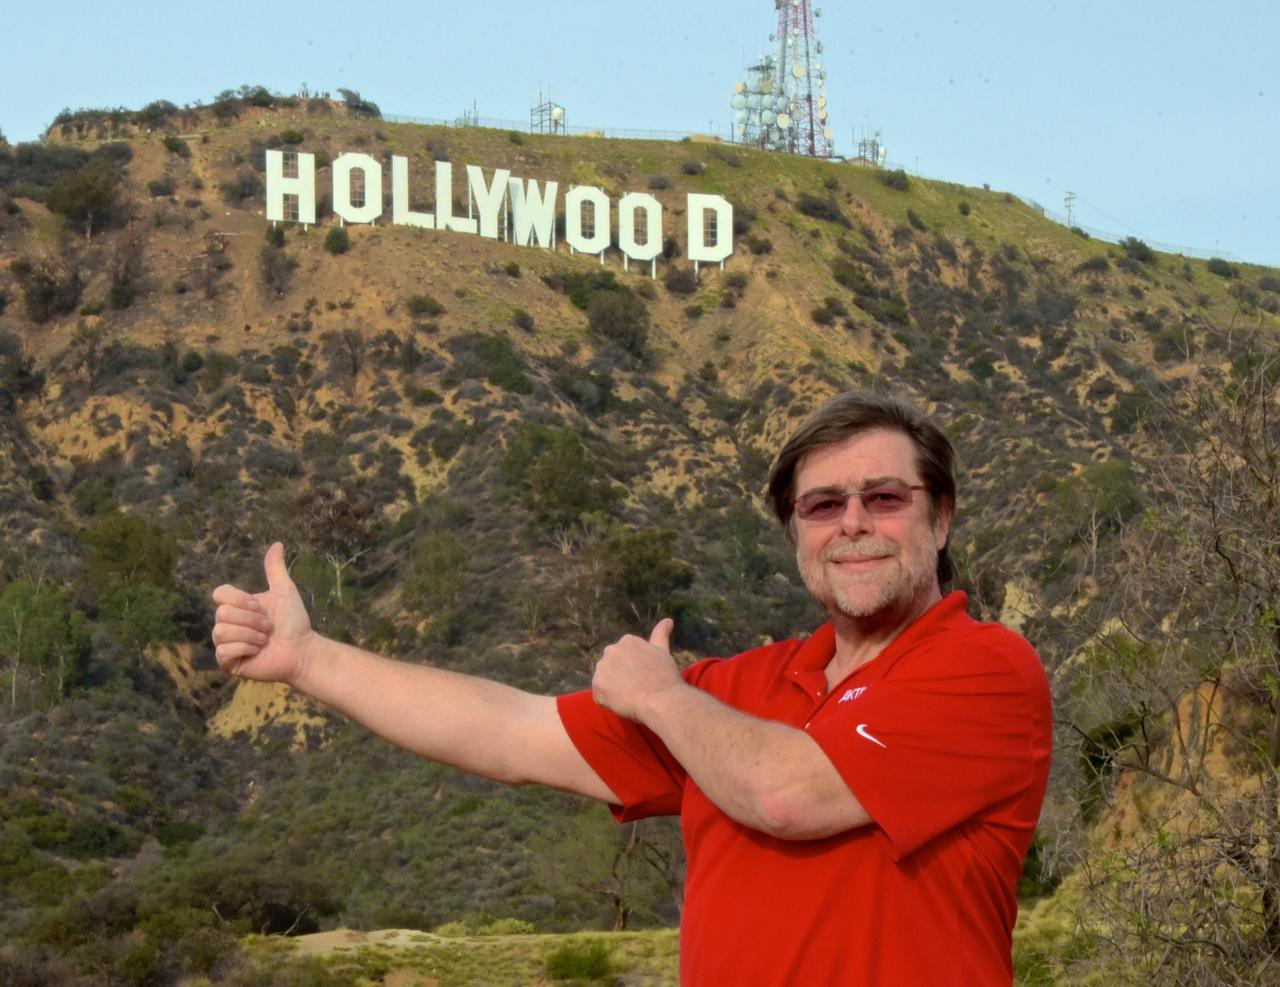 Wolfgang Gößwein vor dem berühmten Hollywood-Sign.